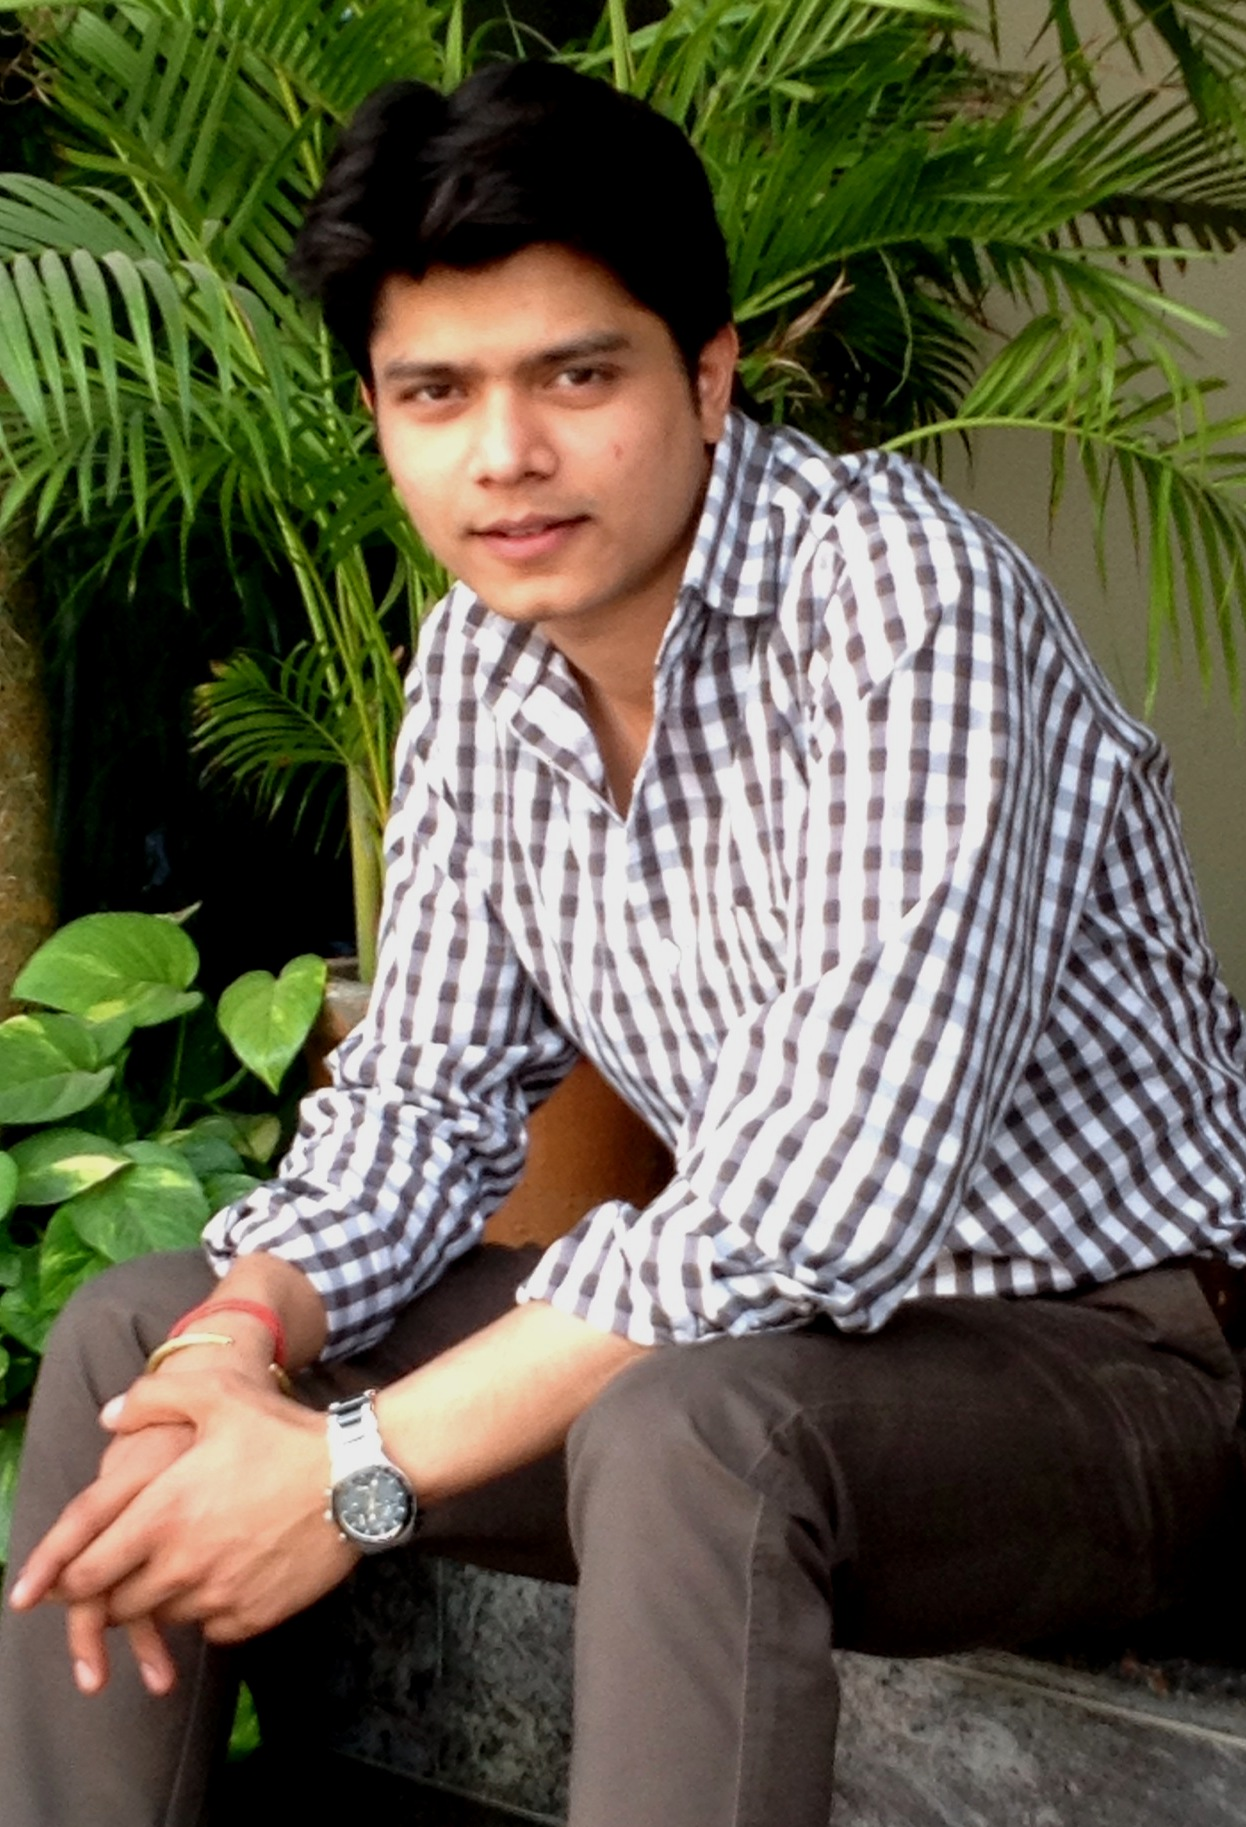 Dhruv Bansal